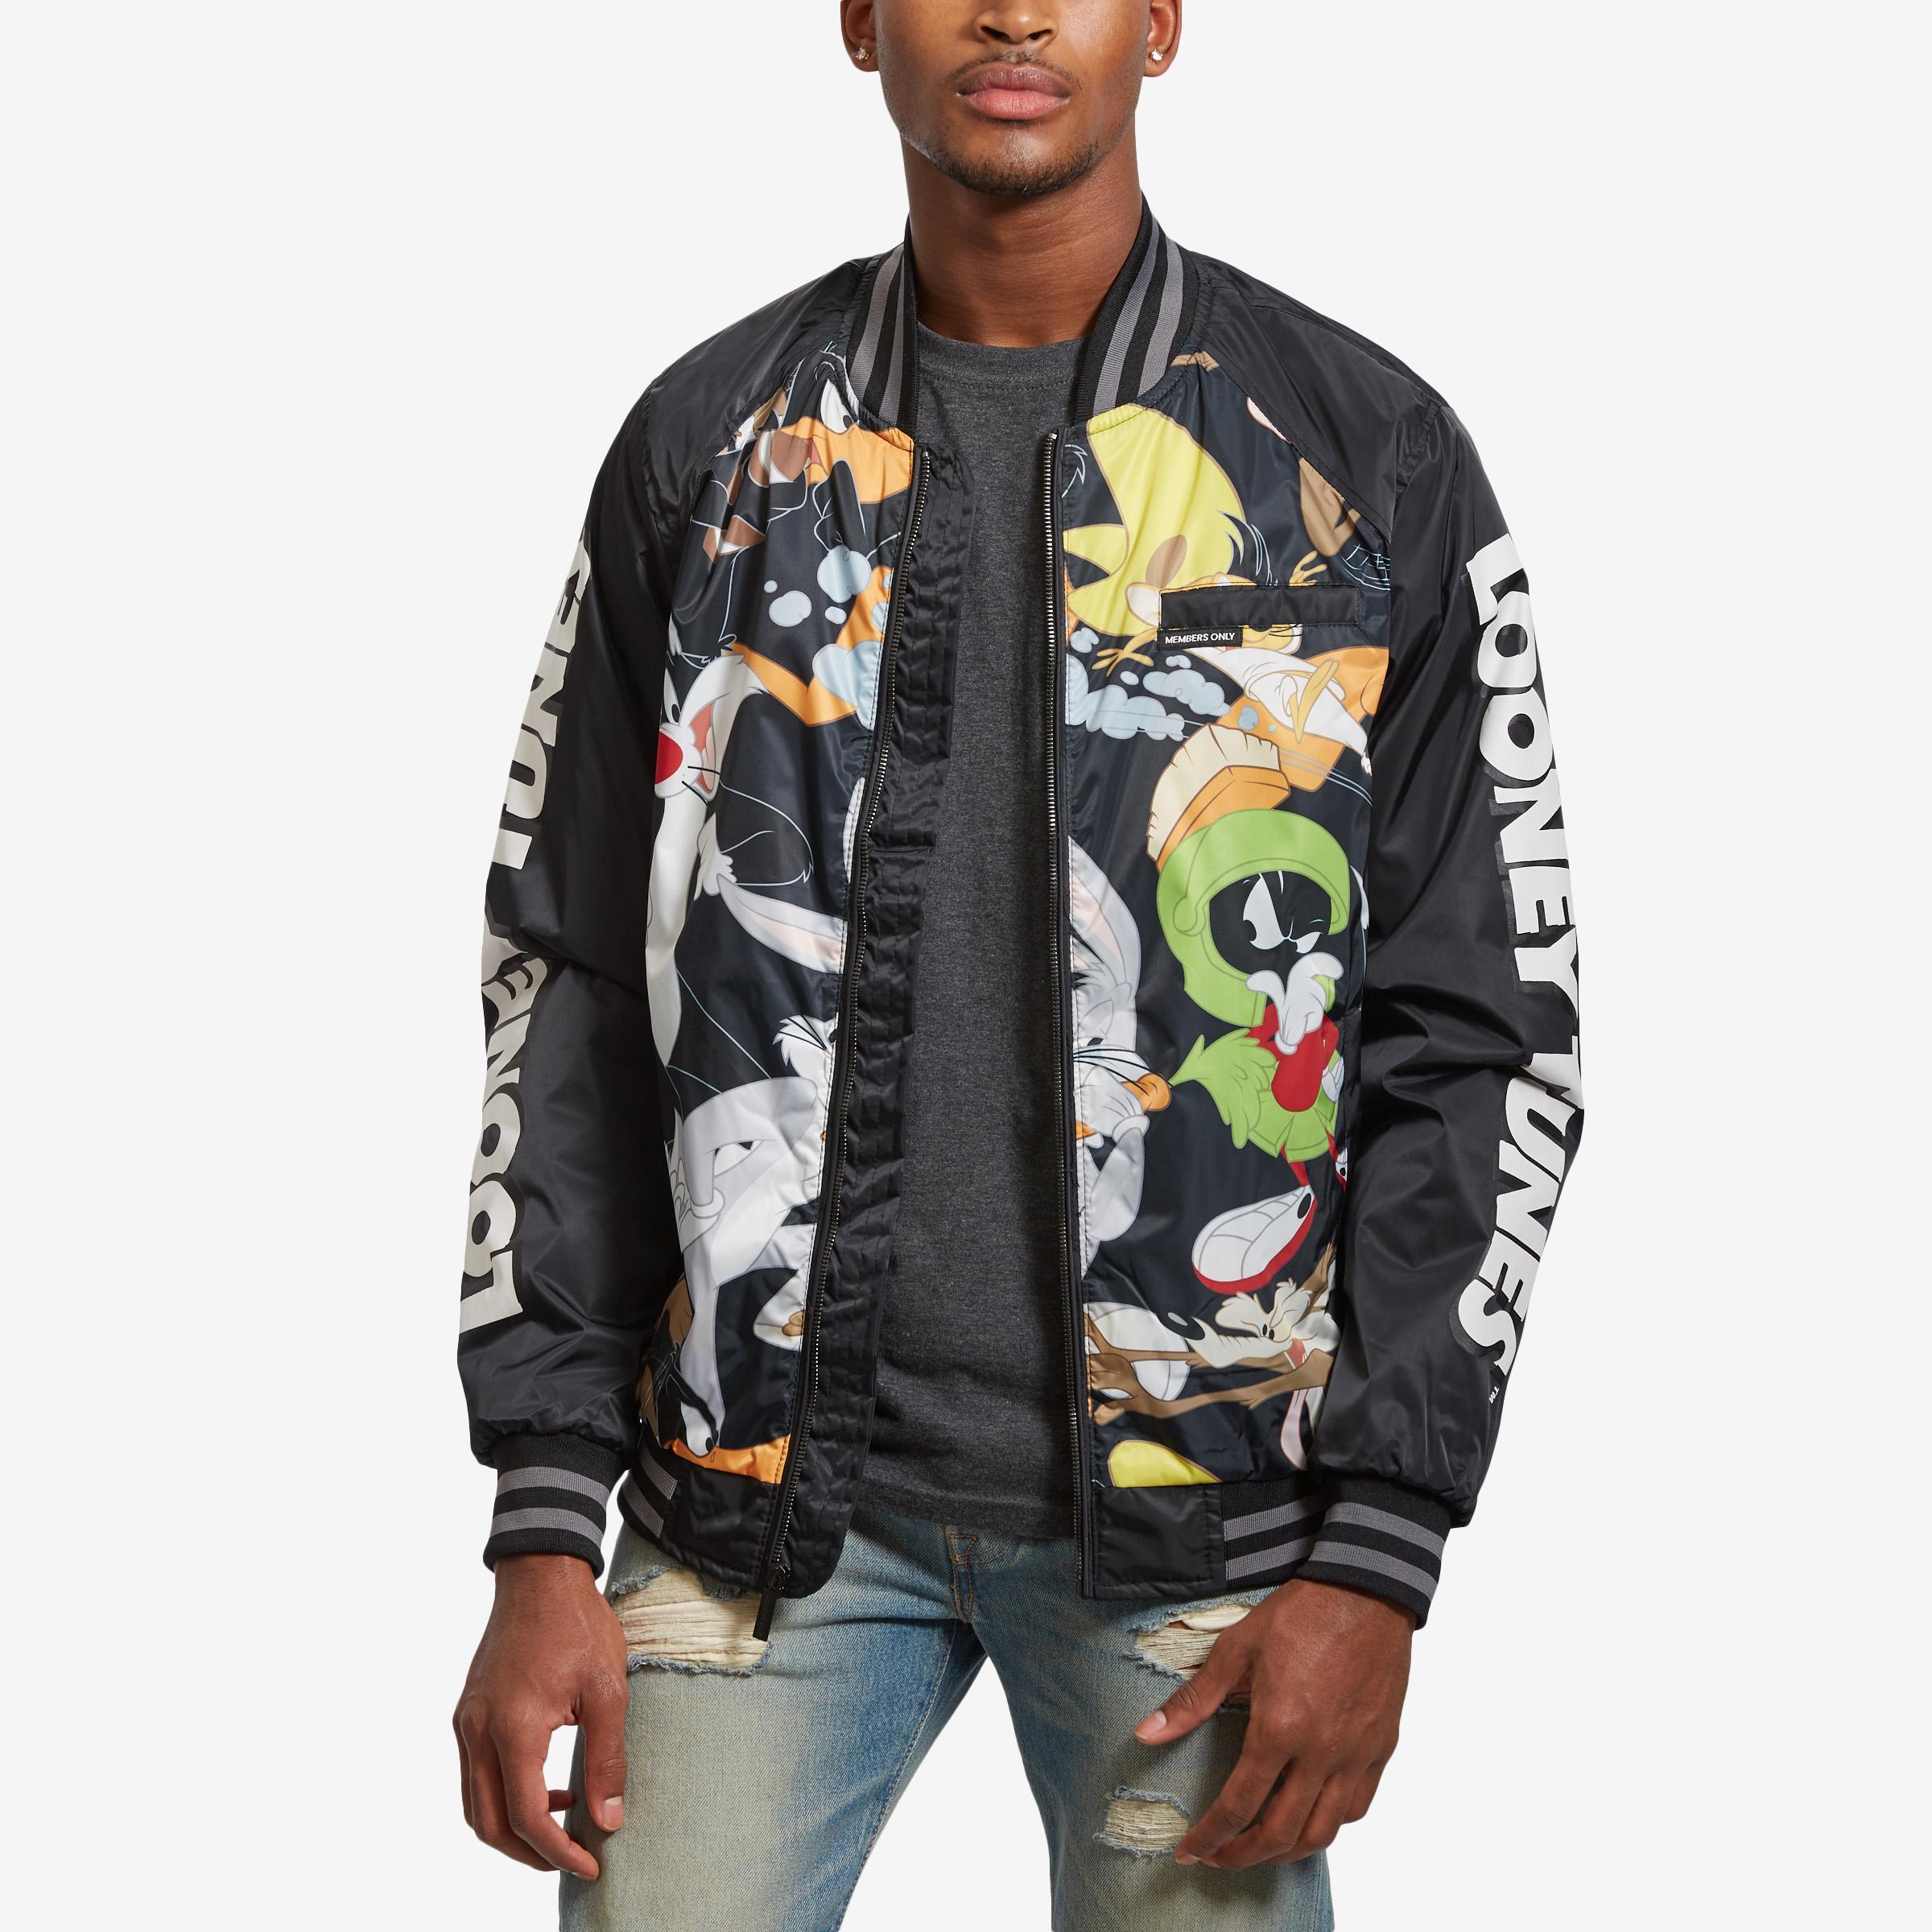 Men's All Over Mash Print Bomber Jacket